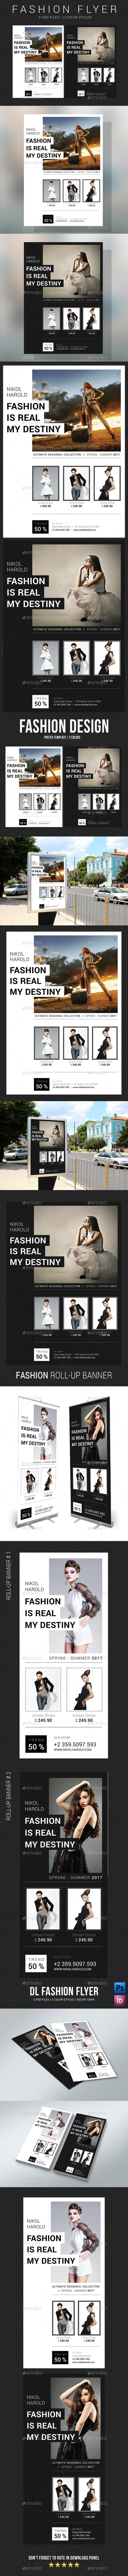 4 Fashion Flyer Poster Banner Bundle - Signage Print Templates